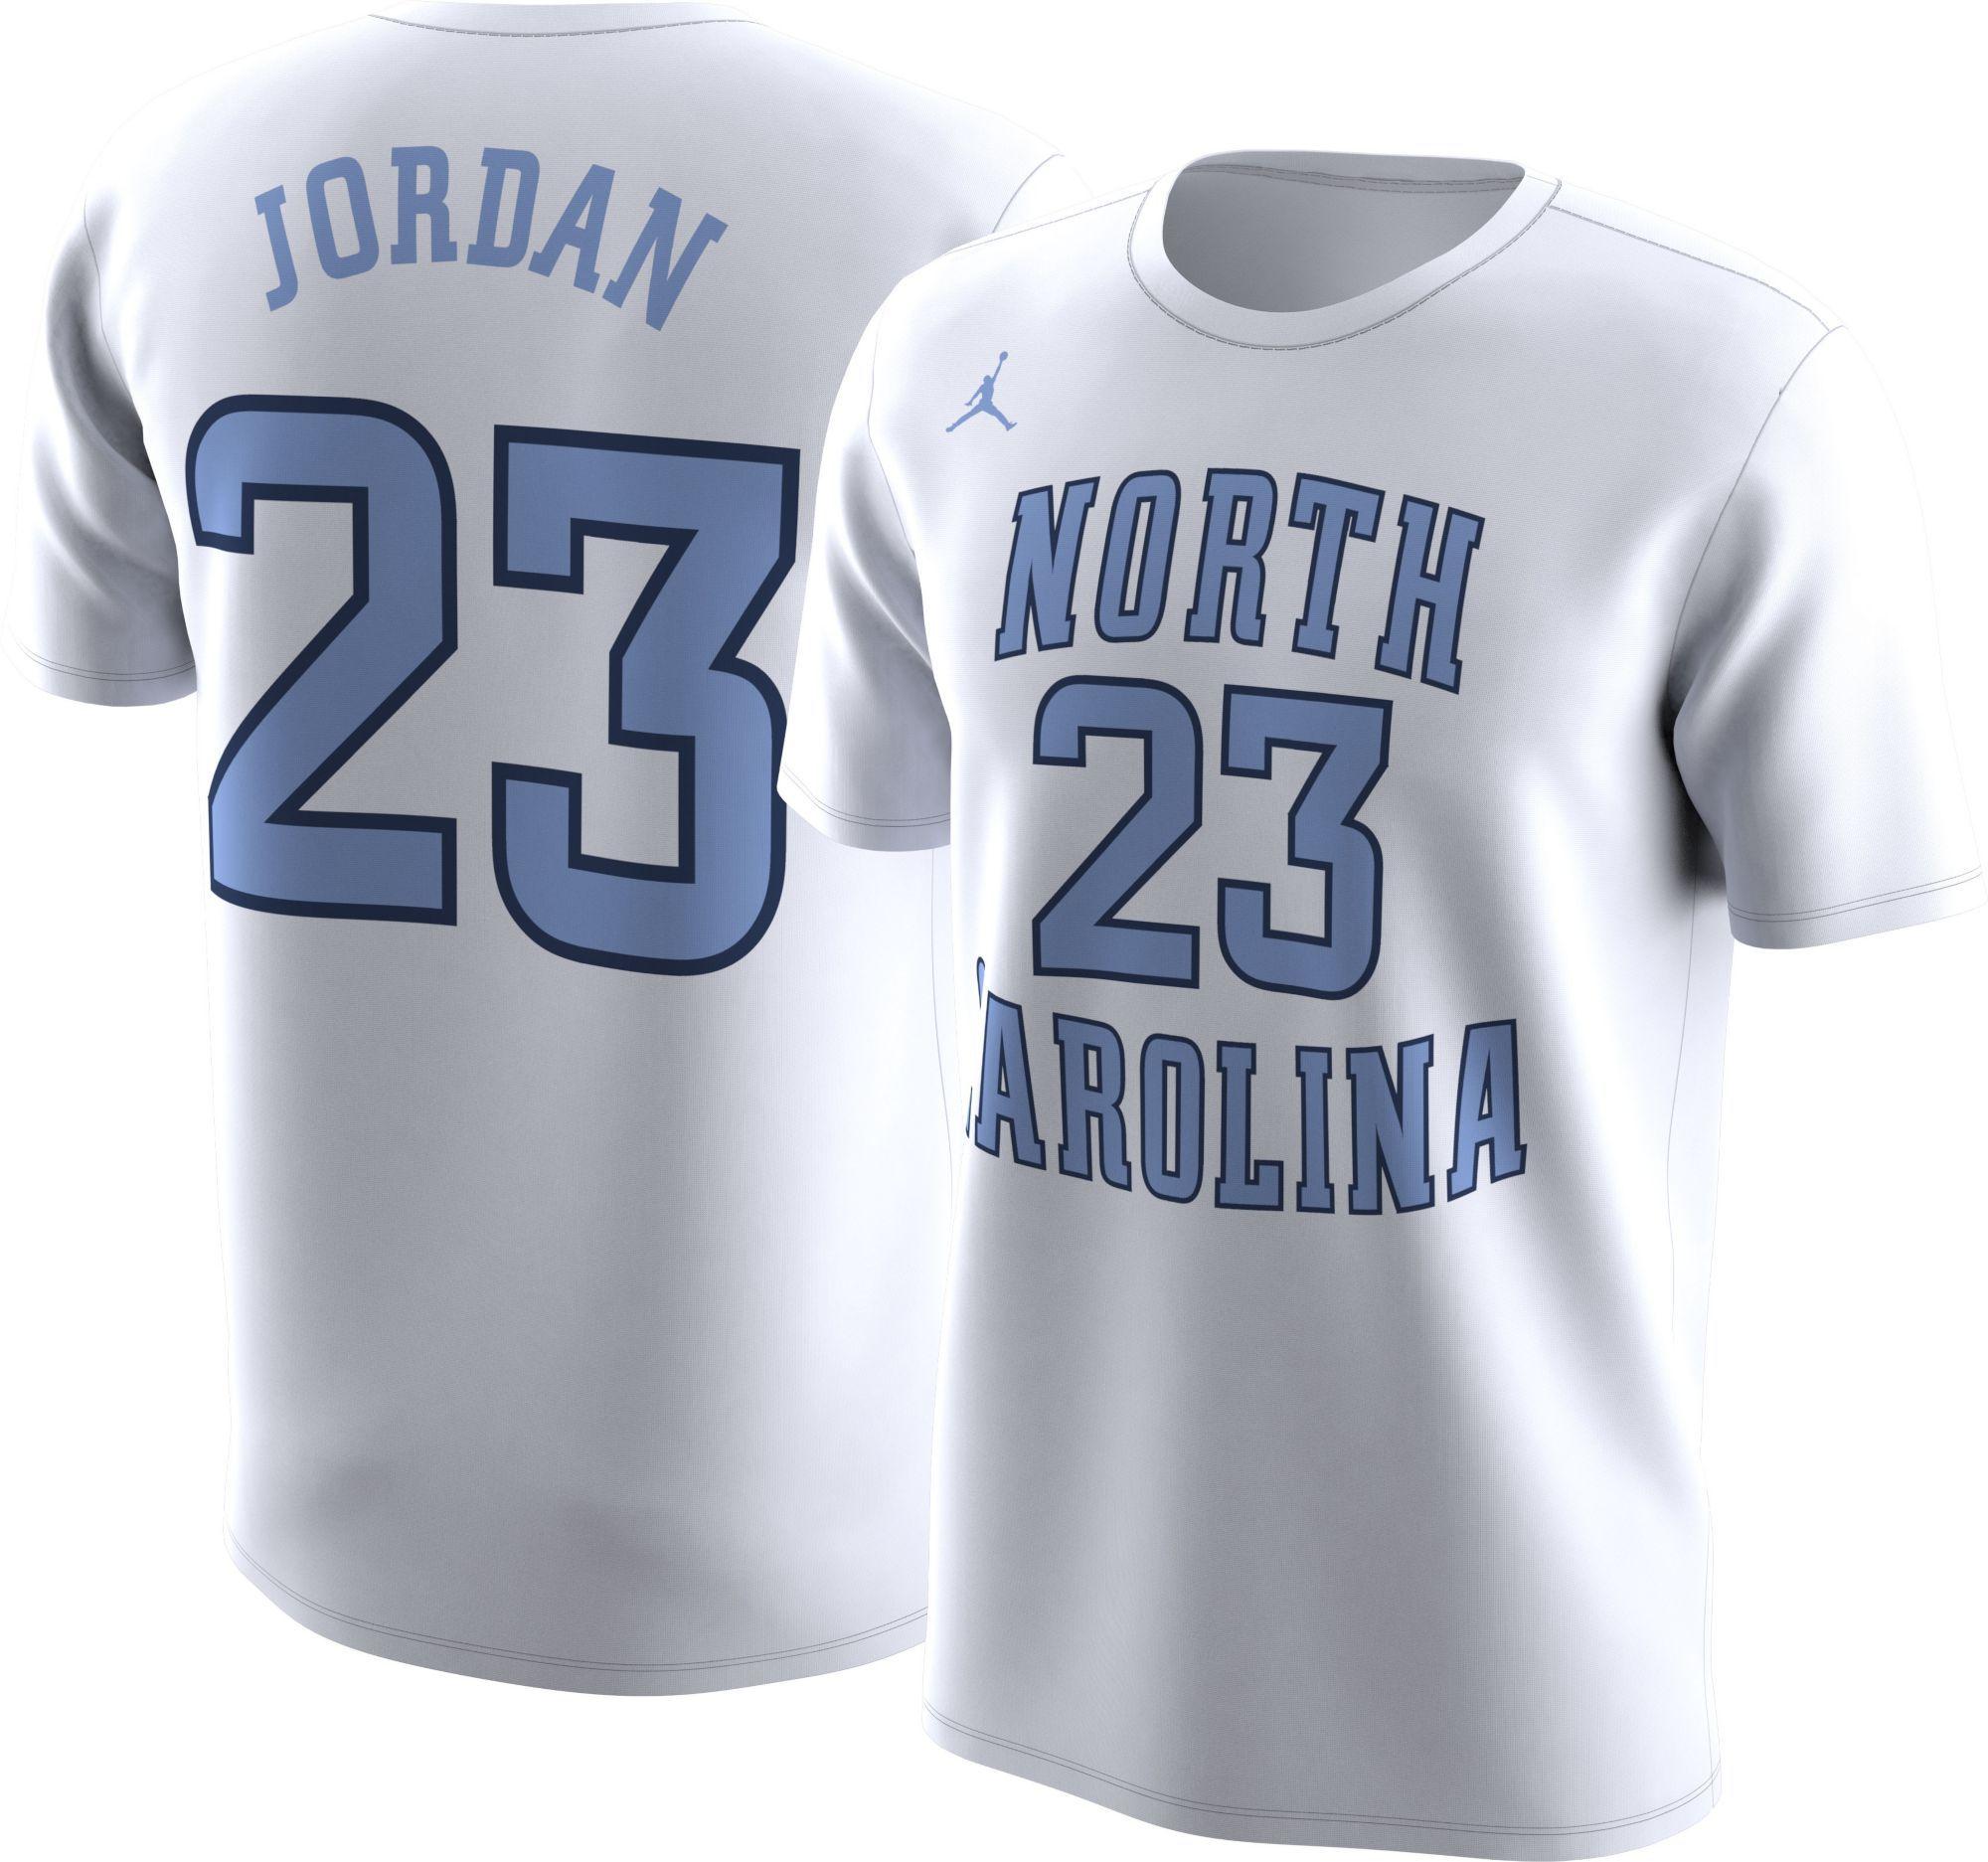 dcbd5f99a66 Jordan Men's North Carolina Tar Heels Michael Jordan #23 Future Star  Basketball White Jersey T-Shirt